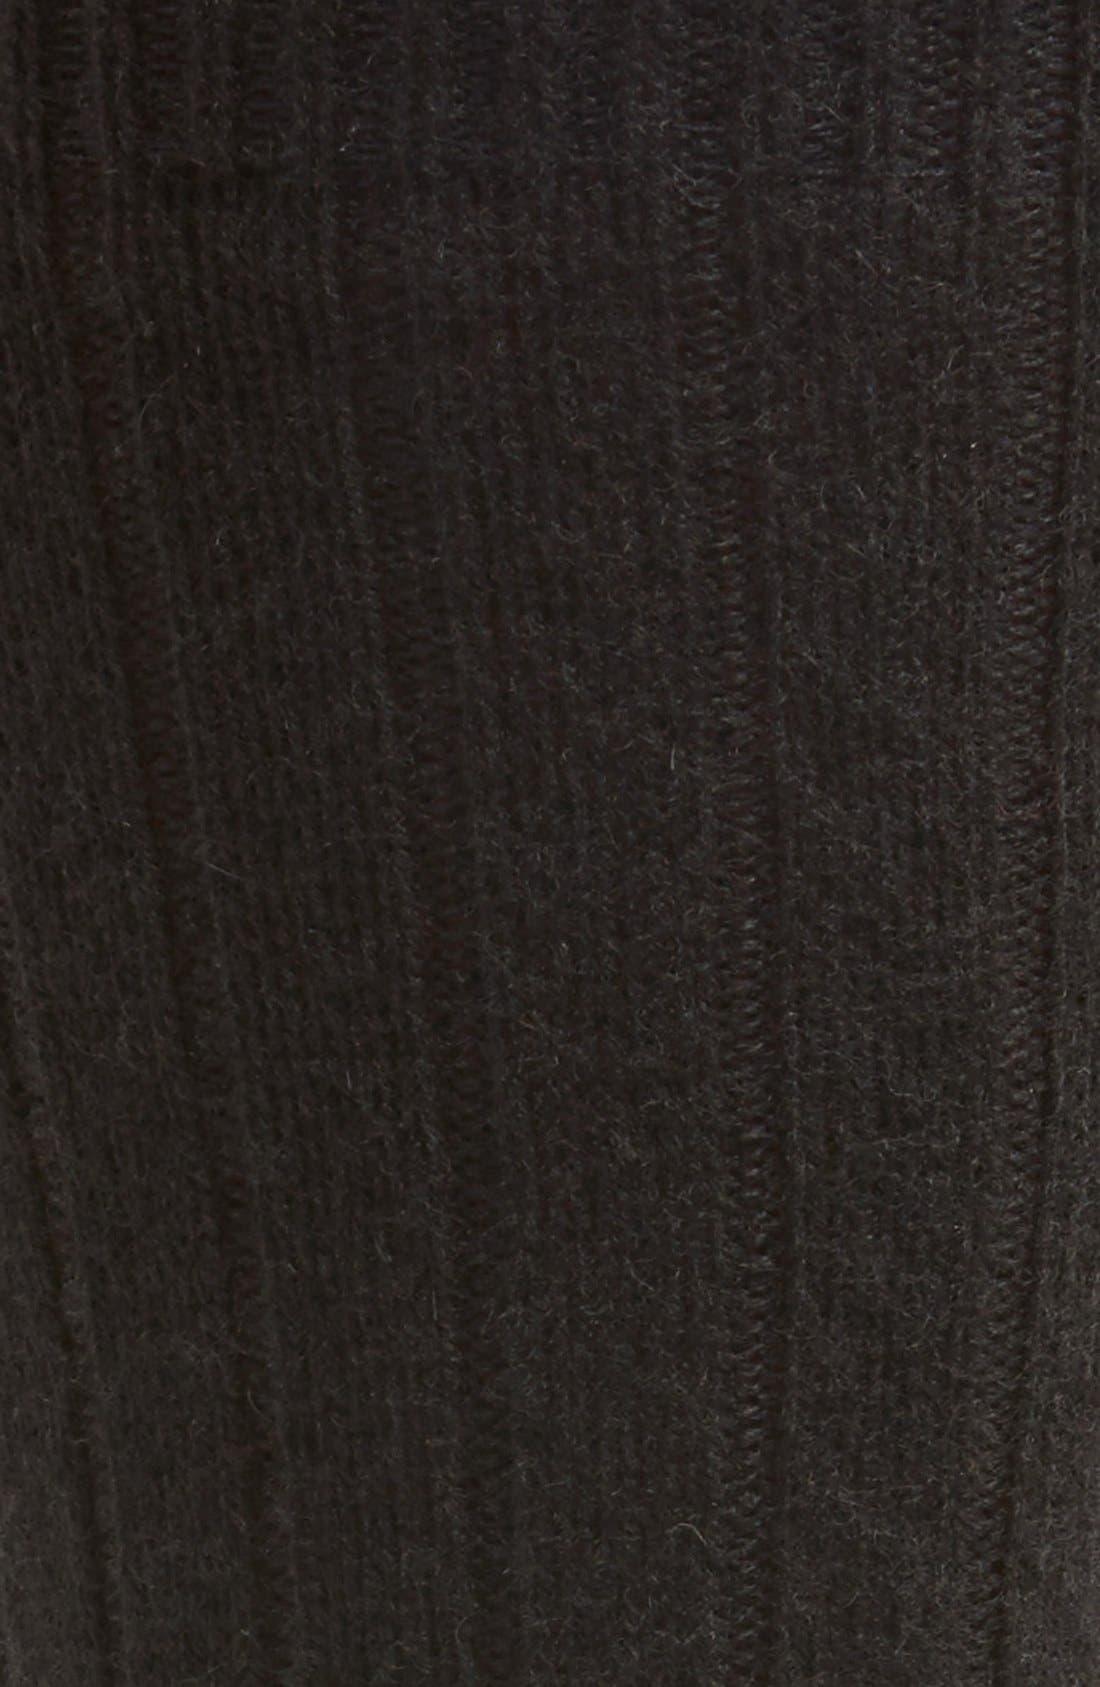 'Waddington' Cashmere Blend Mid Calf Socks,                             Alternate thumbnail 14, color,